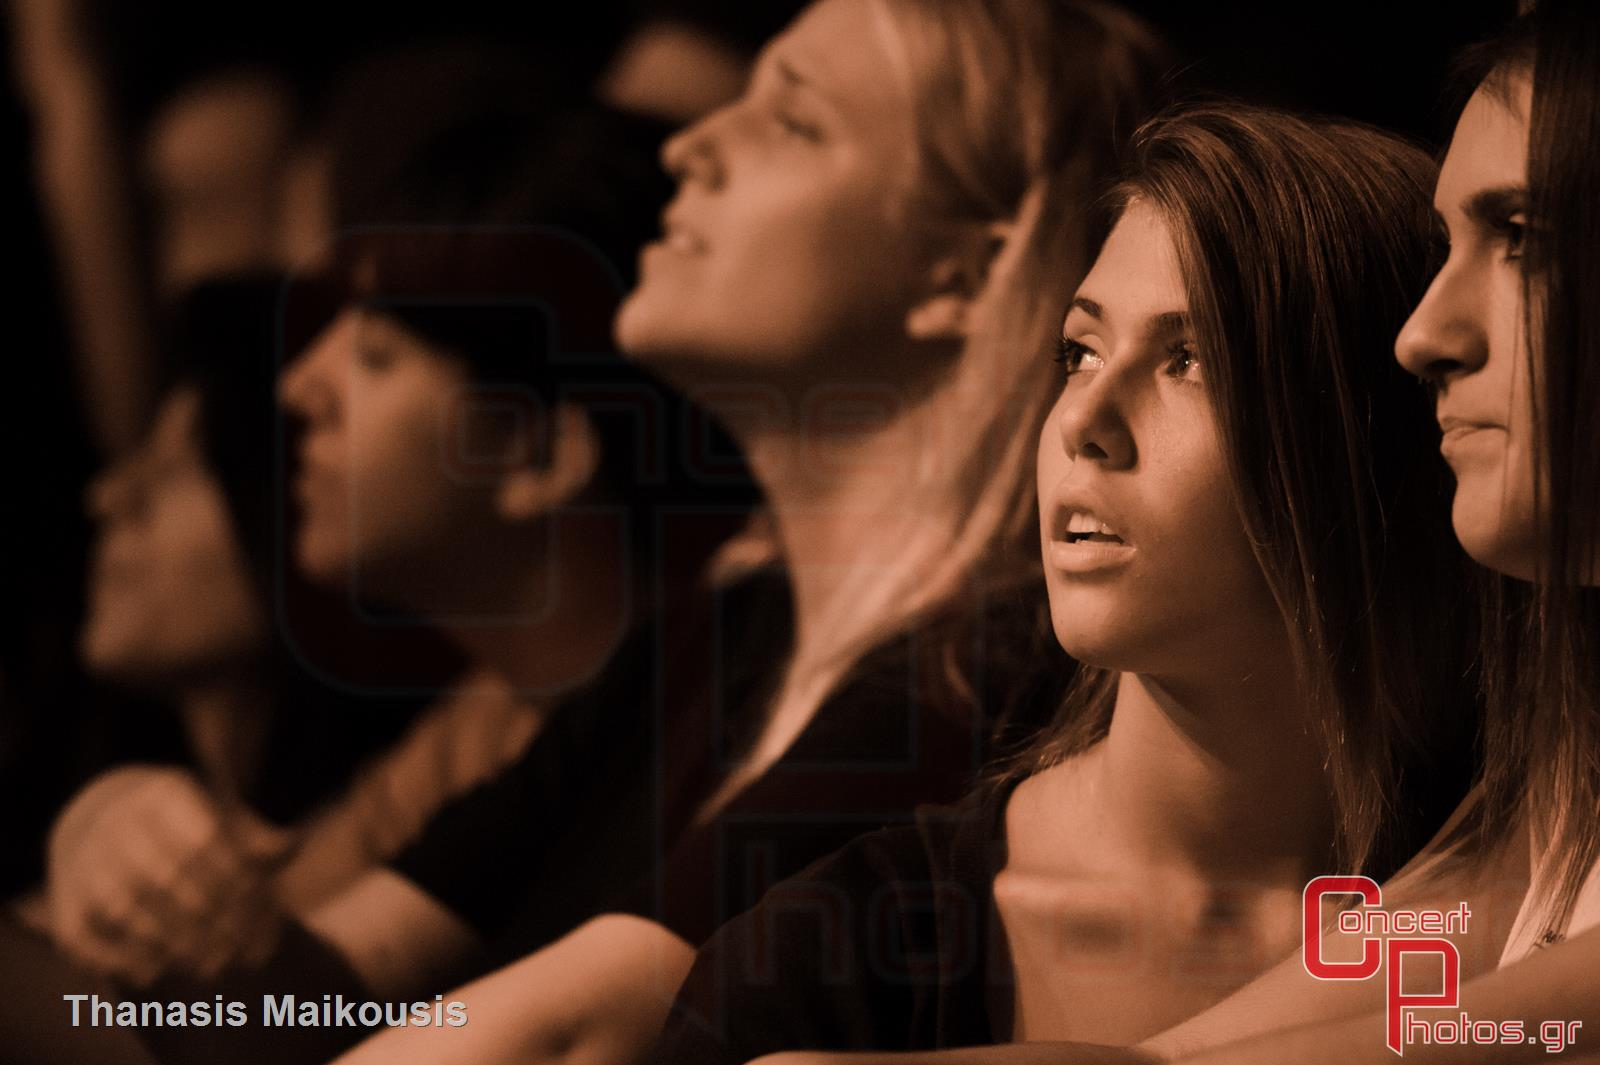 Active Member - Τραγούδα μας να φύγει το σκοτάδι- photographer: Thanasis Maikousis - concertphotos_-5736